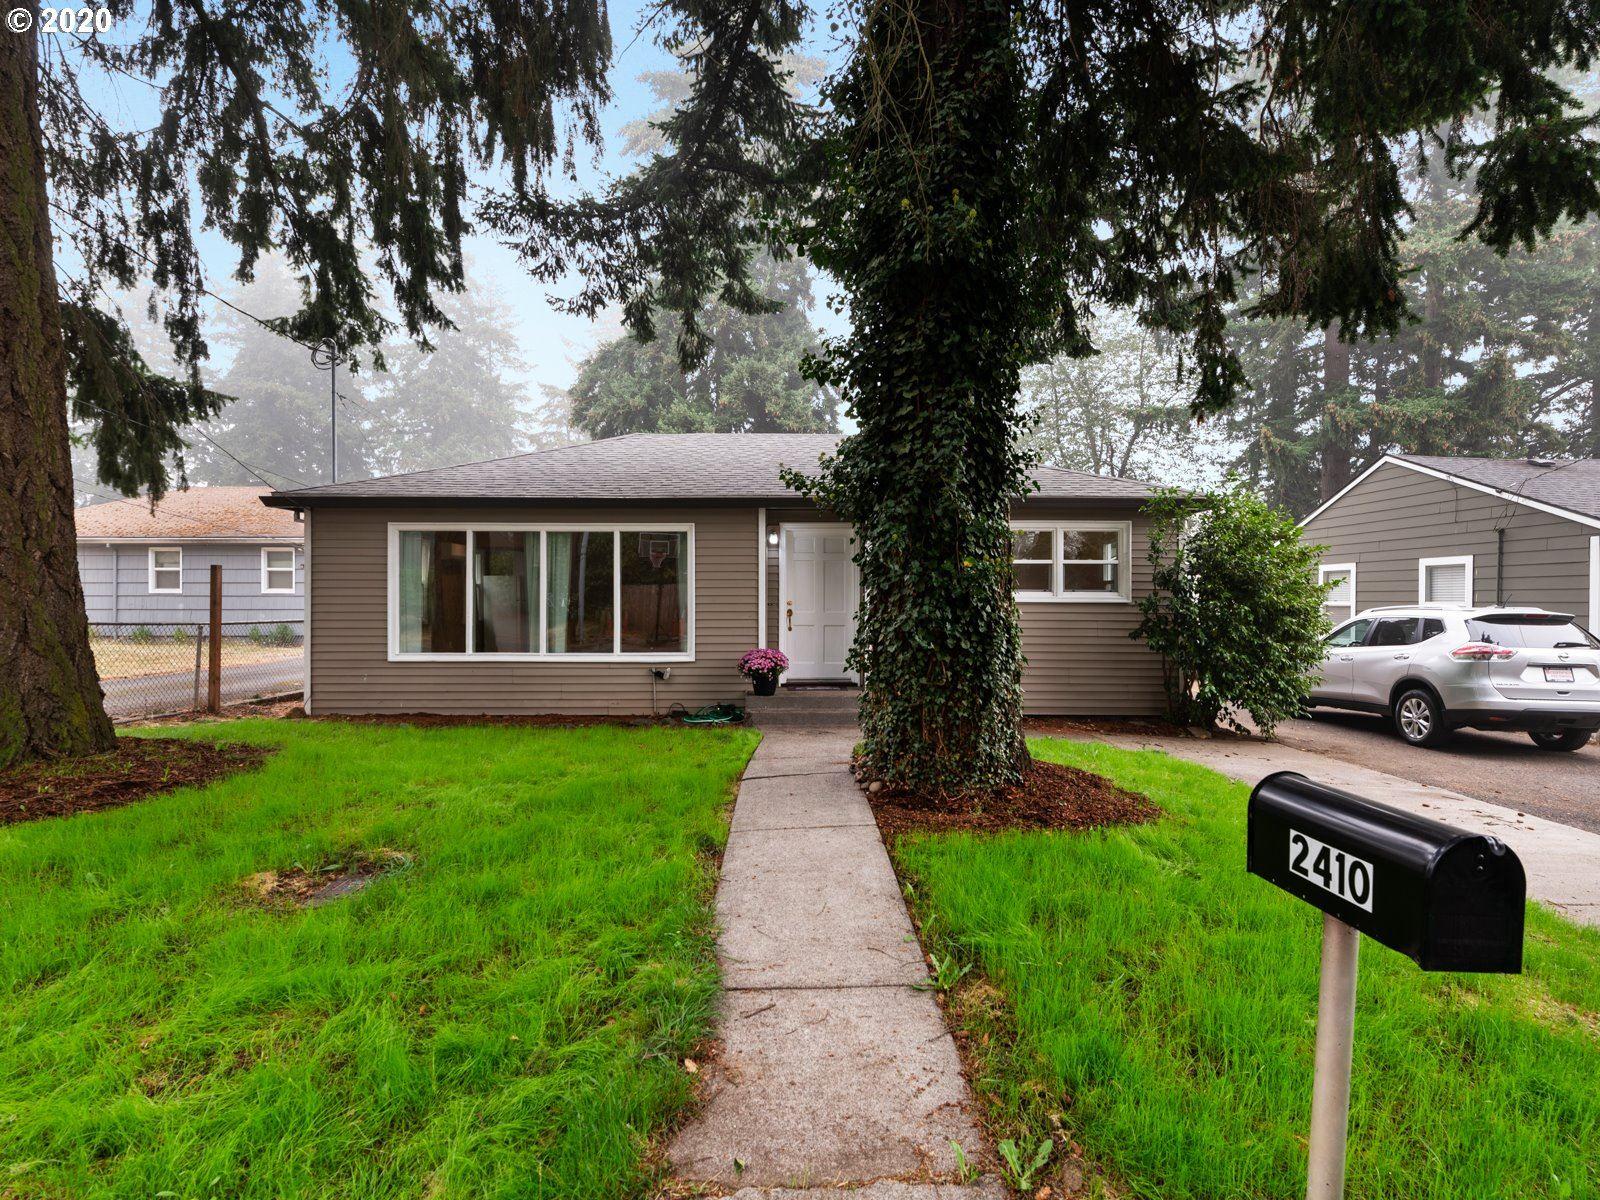 2410 SE 141ST AVE, Portland, OR 97233 - MLS#: 20002278